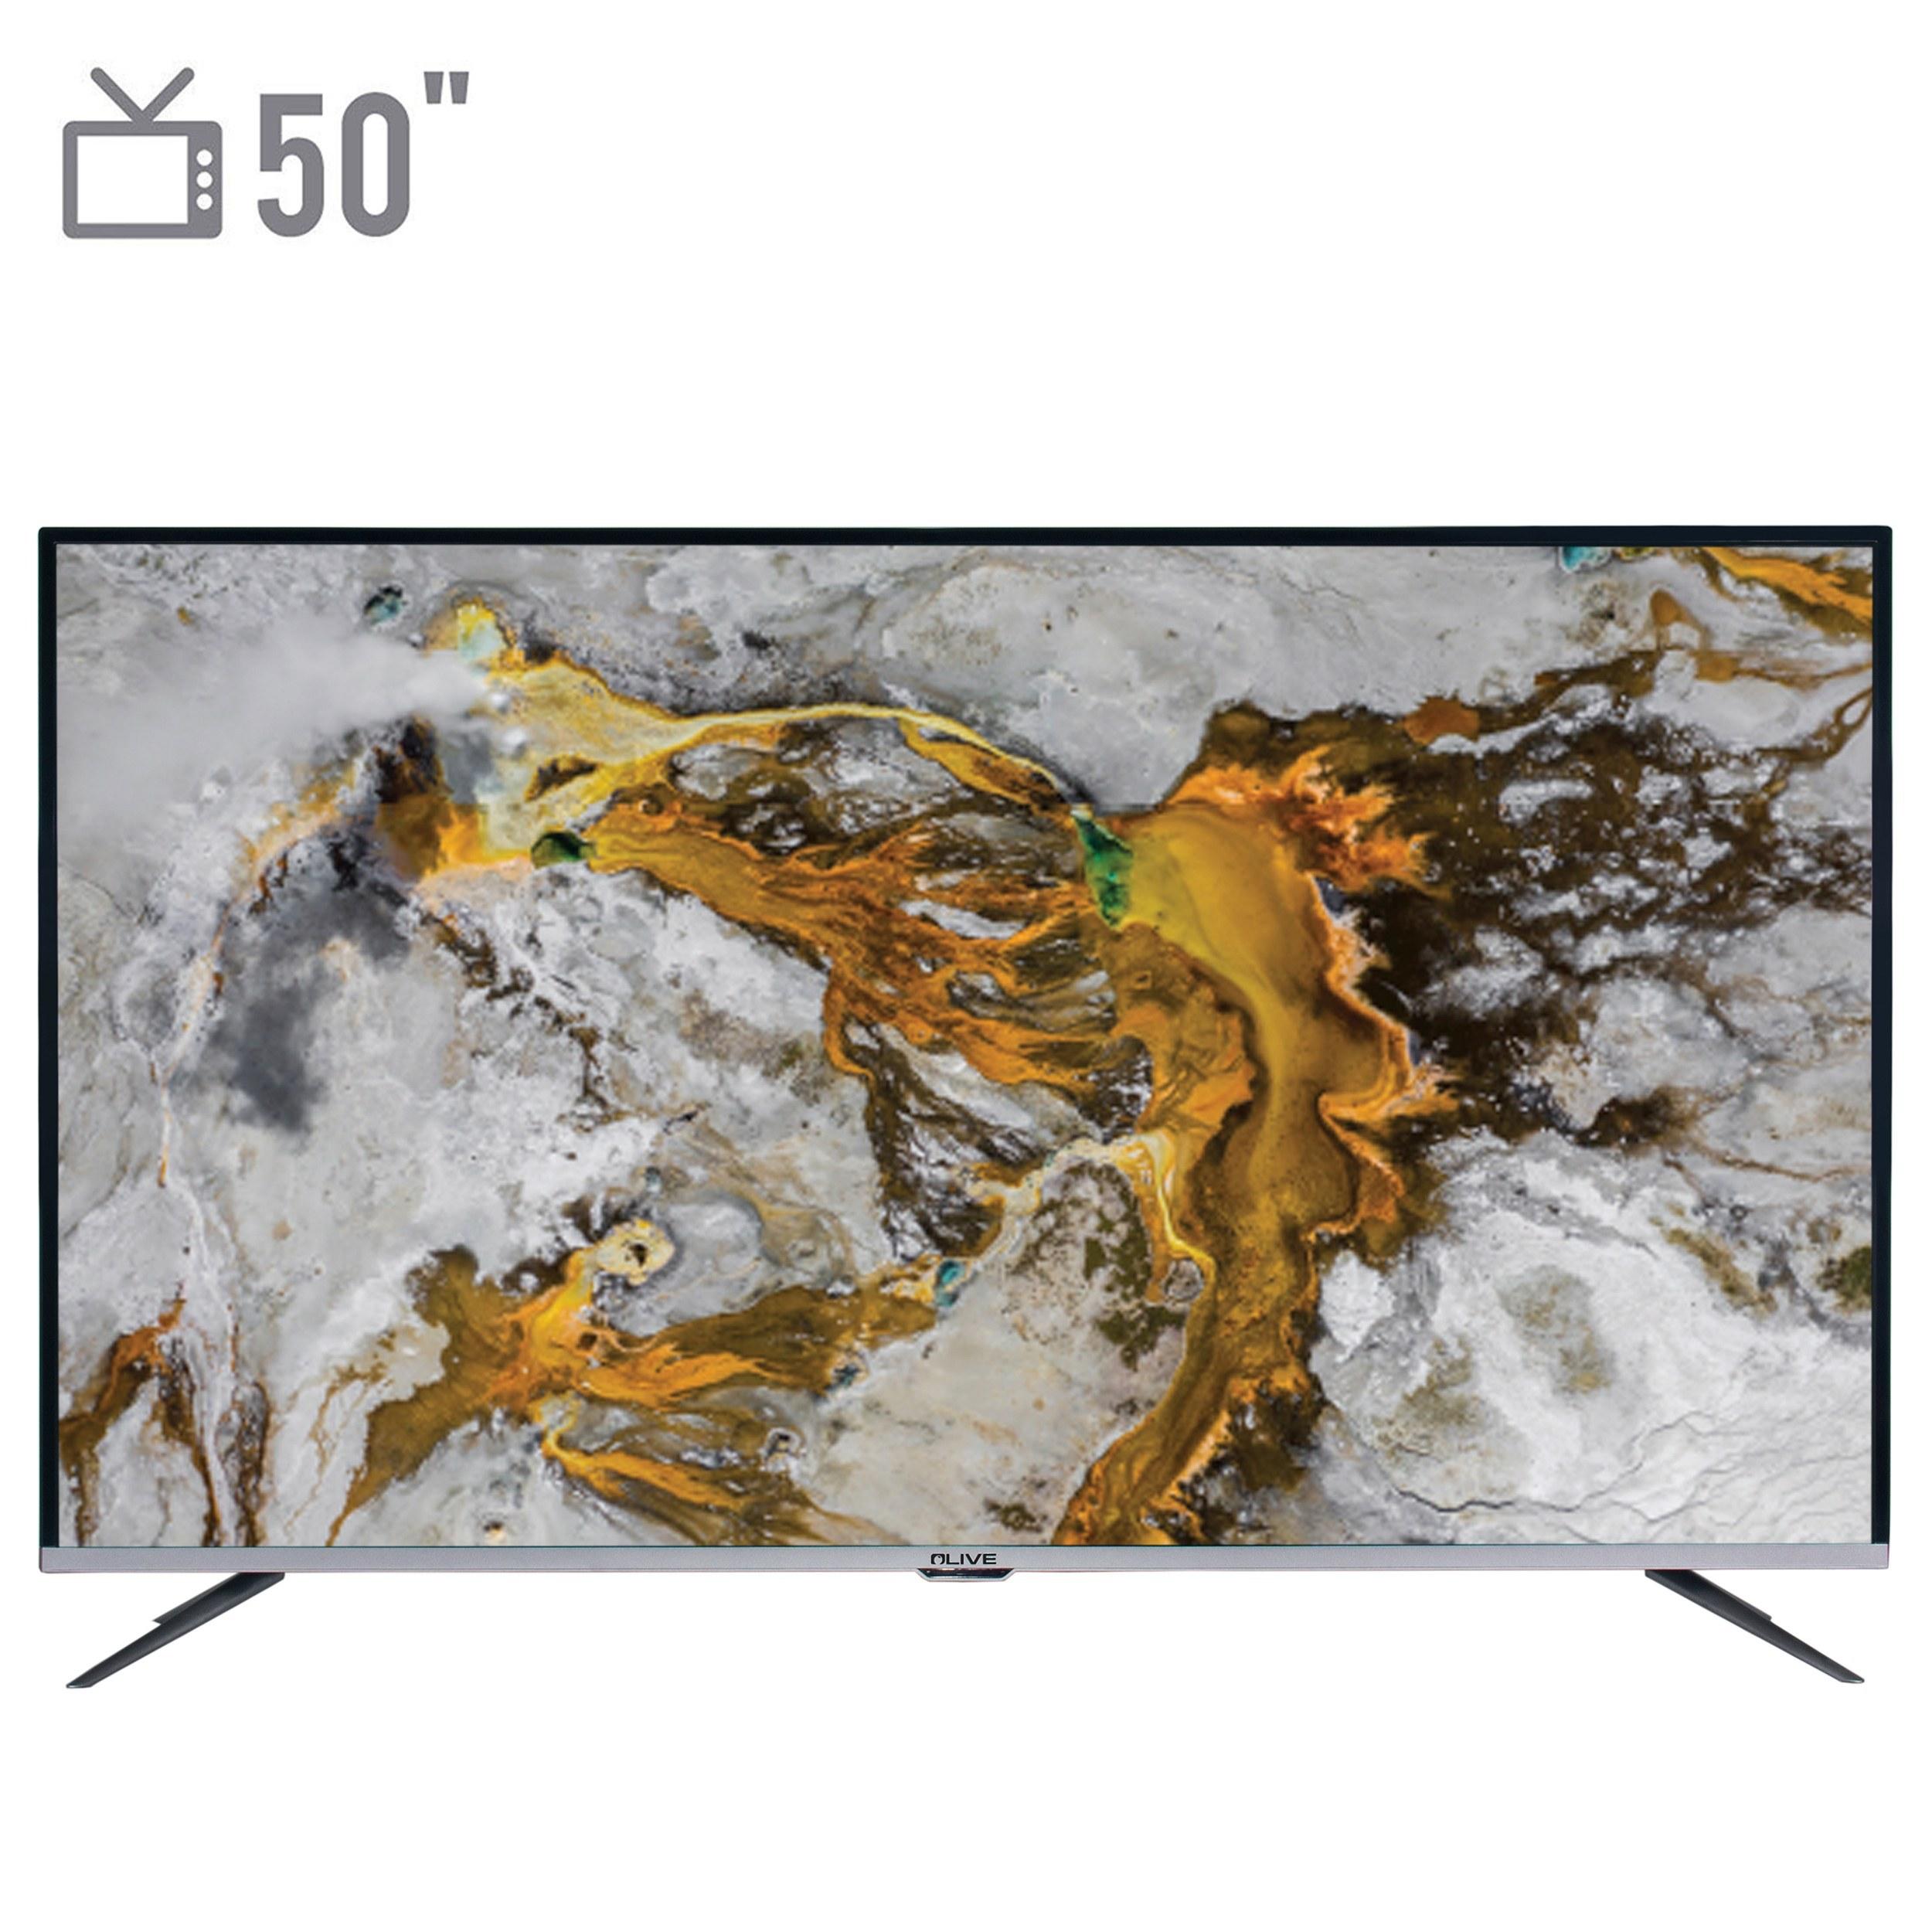 تصویر تلویزیون ال ای دی هوشمند الیو مدل 50UA8430 سایز 50 اینچ Olive 50UA8430 Smart LED TV 50 Inch